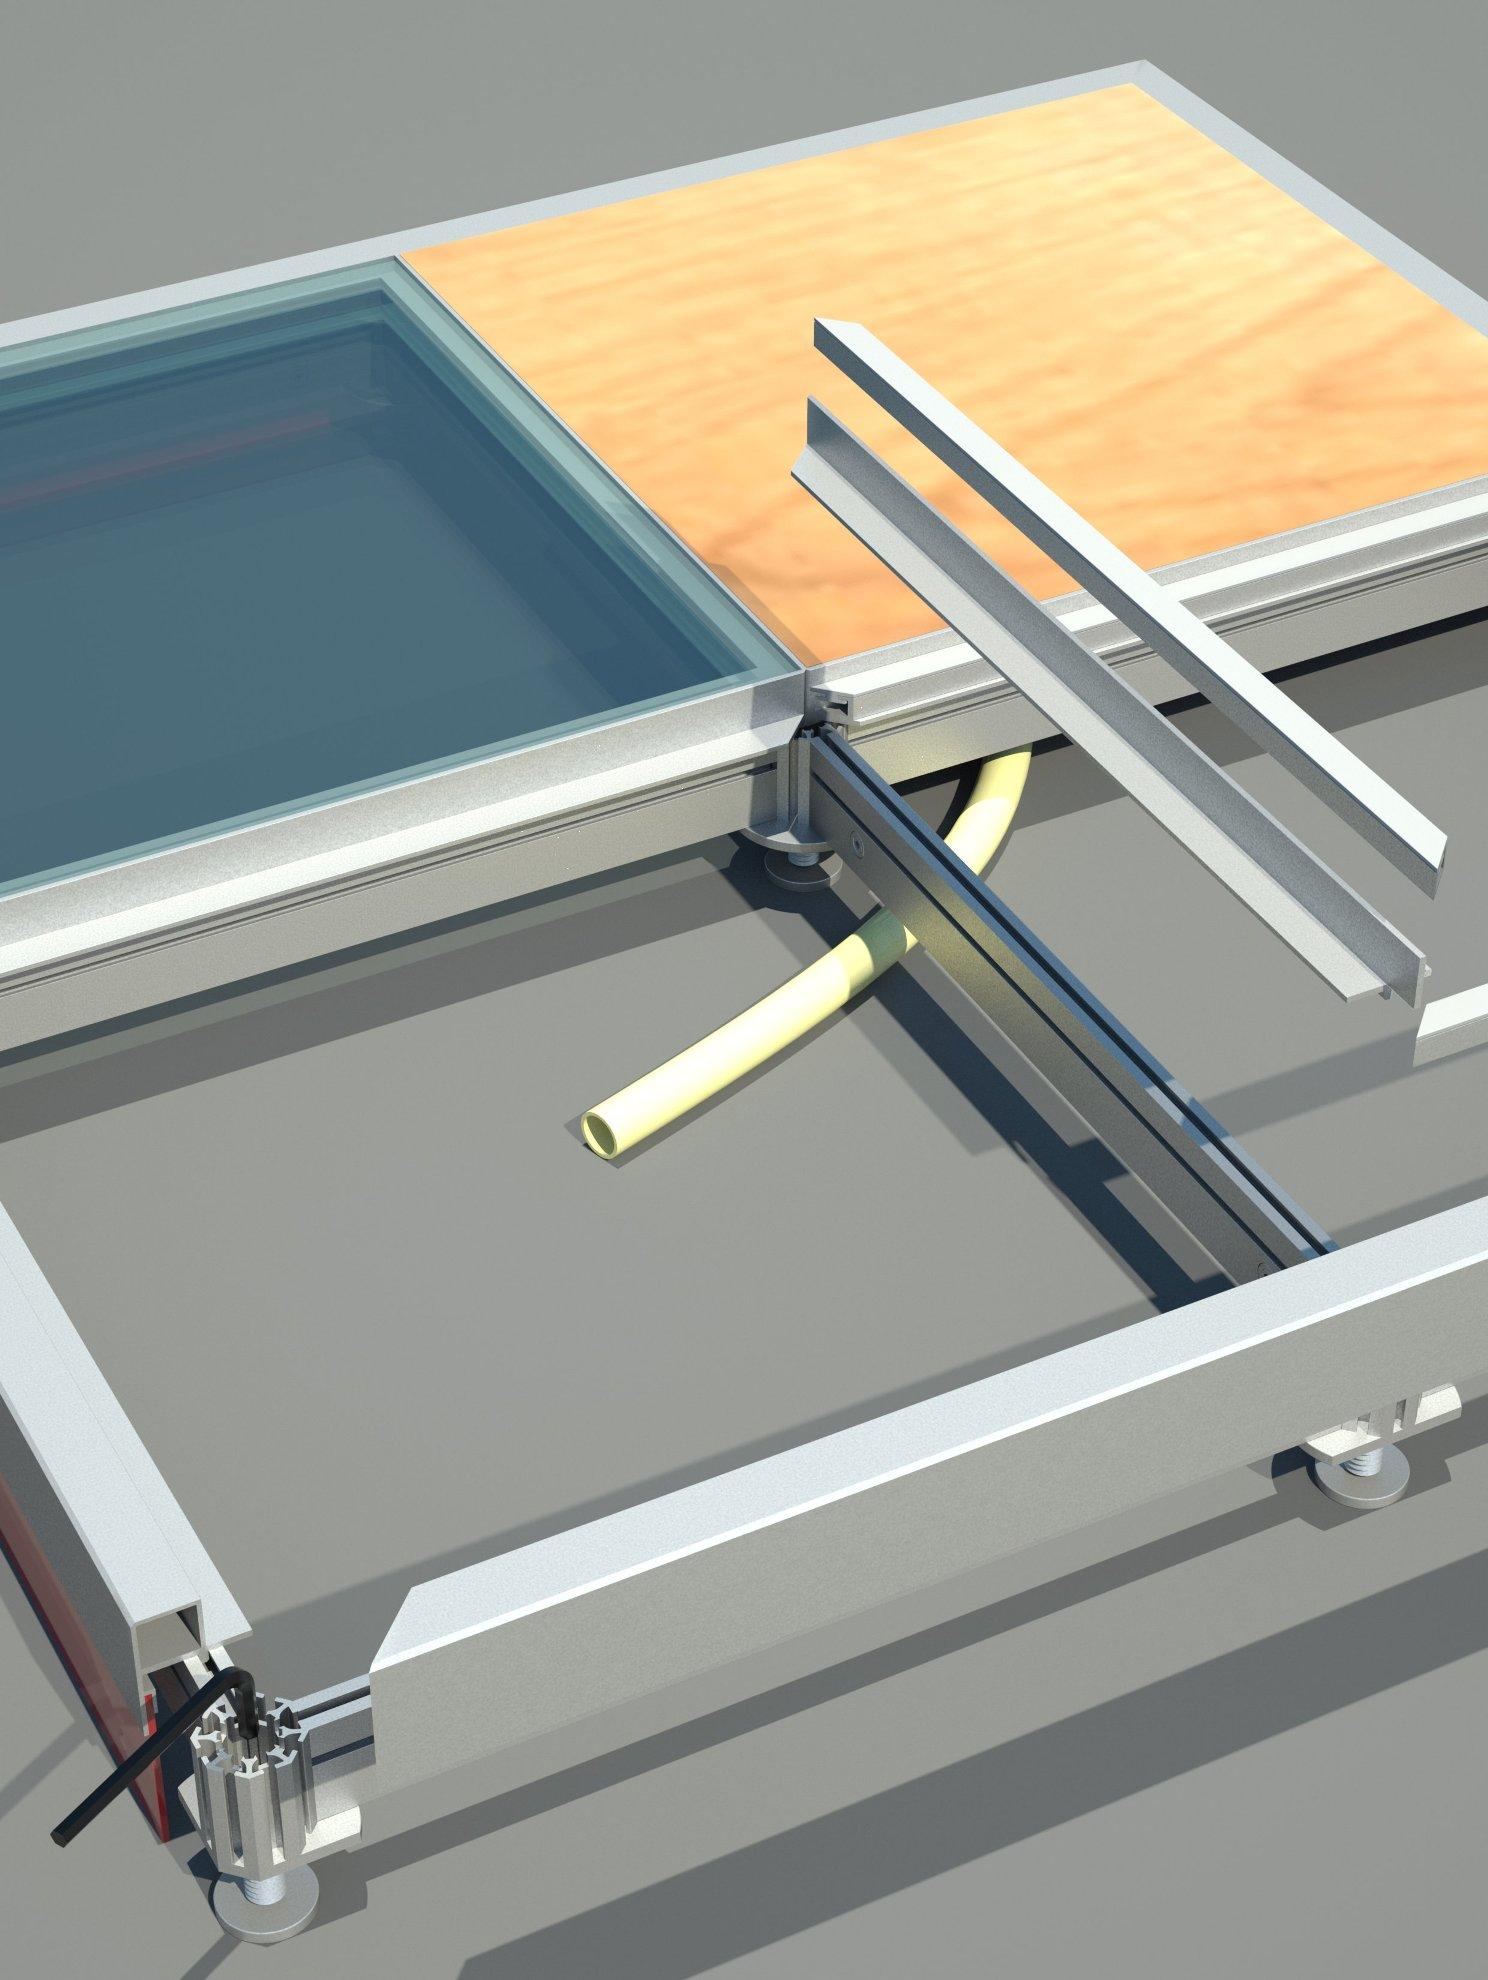 piso elevado vidro estrutura alumínio regulagem altura stands lojas quiosques shopping aeroporto rampa octanorm